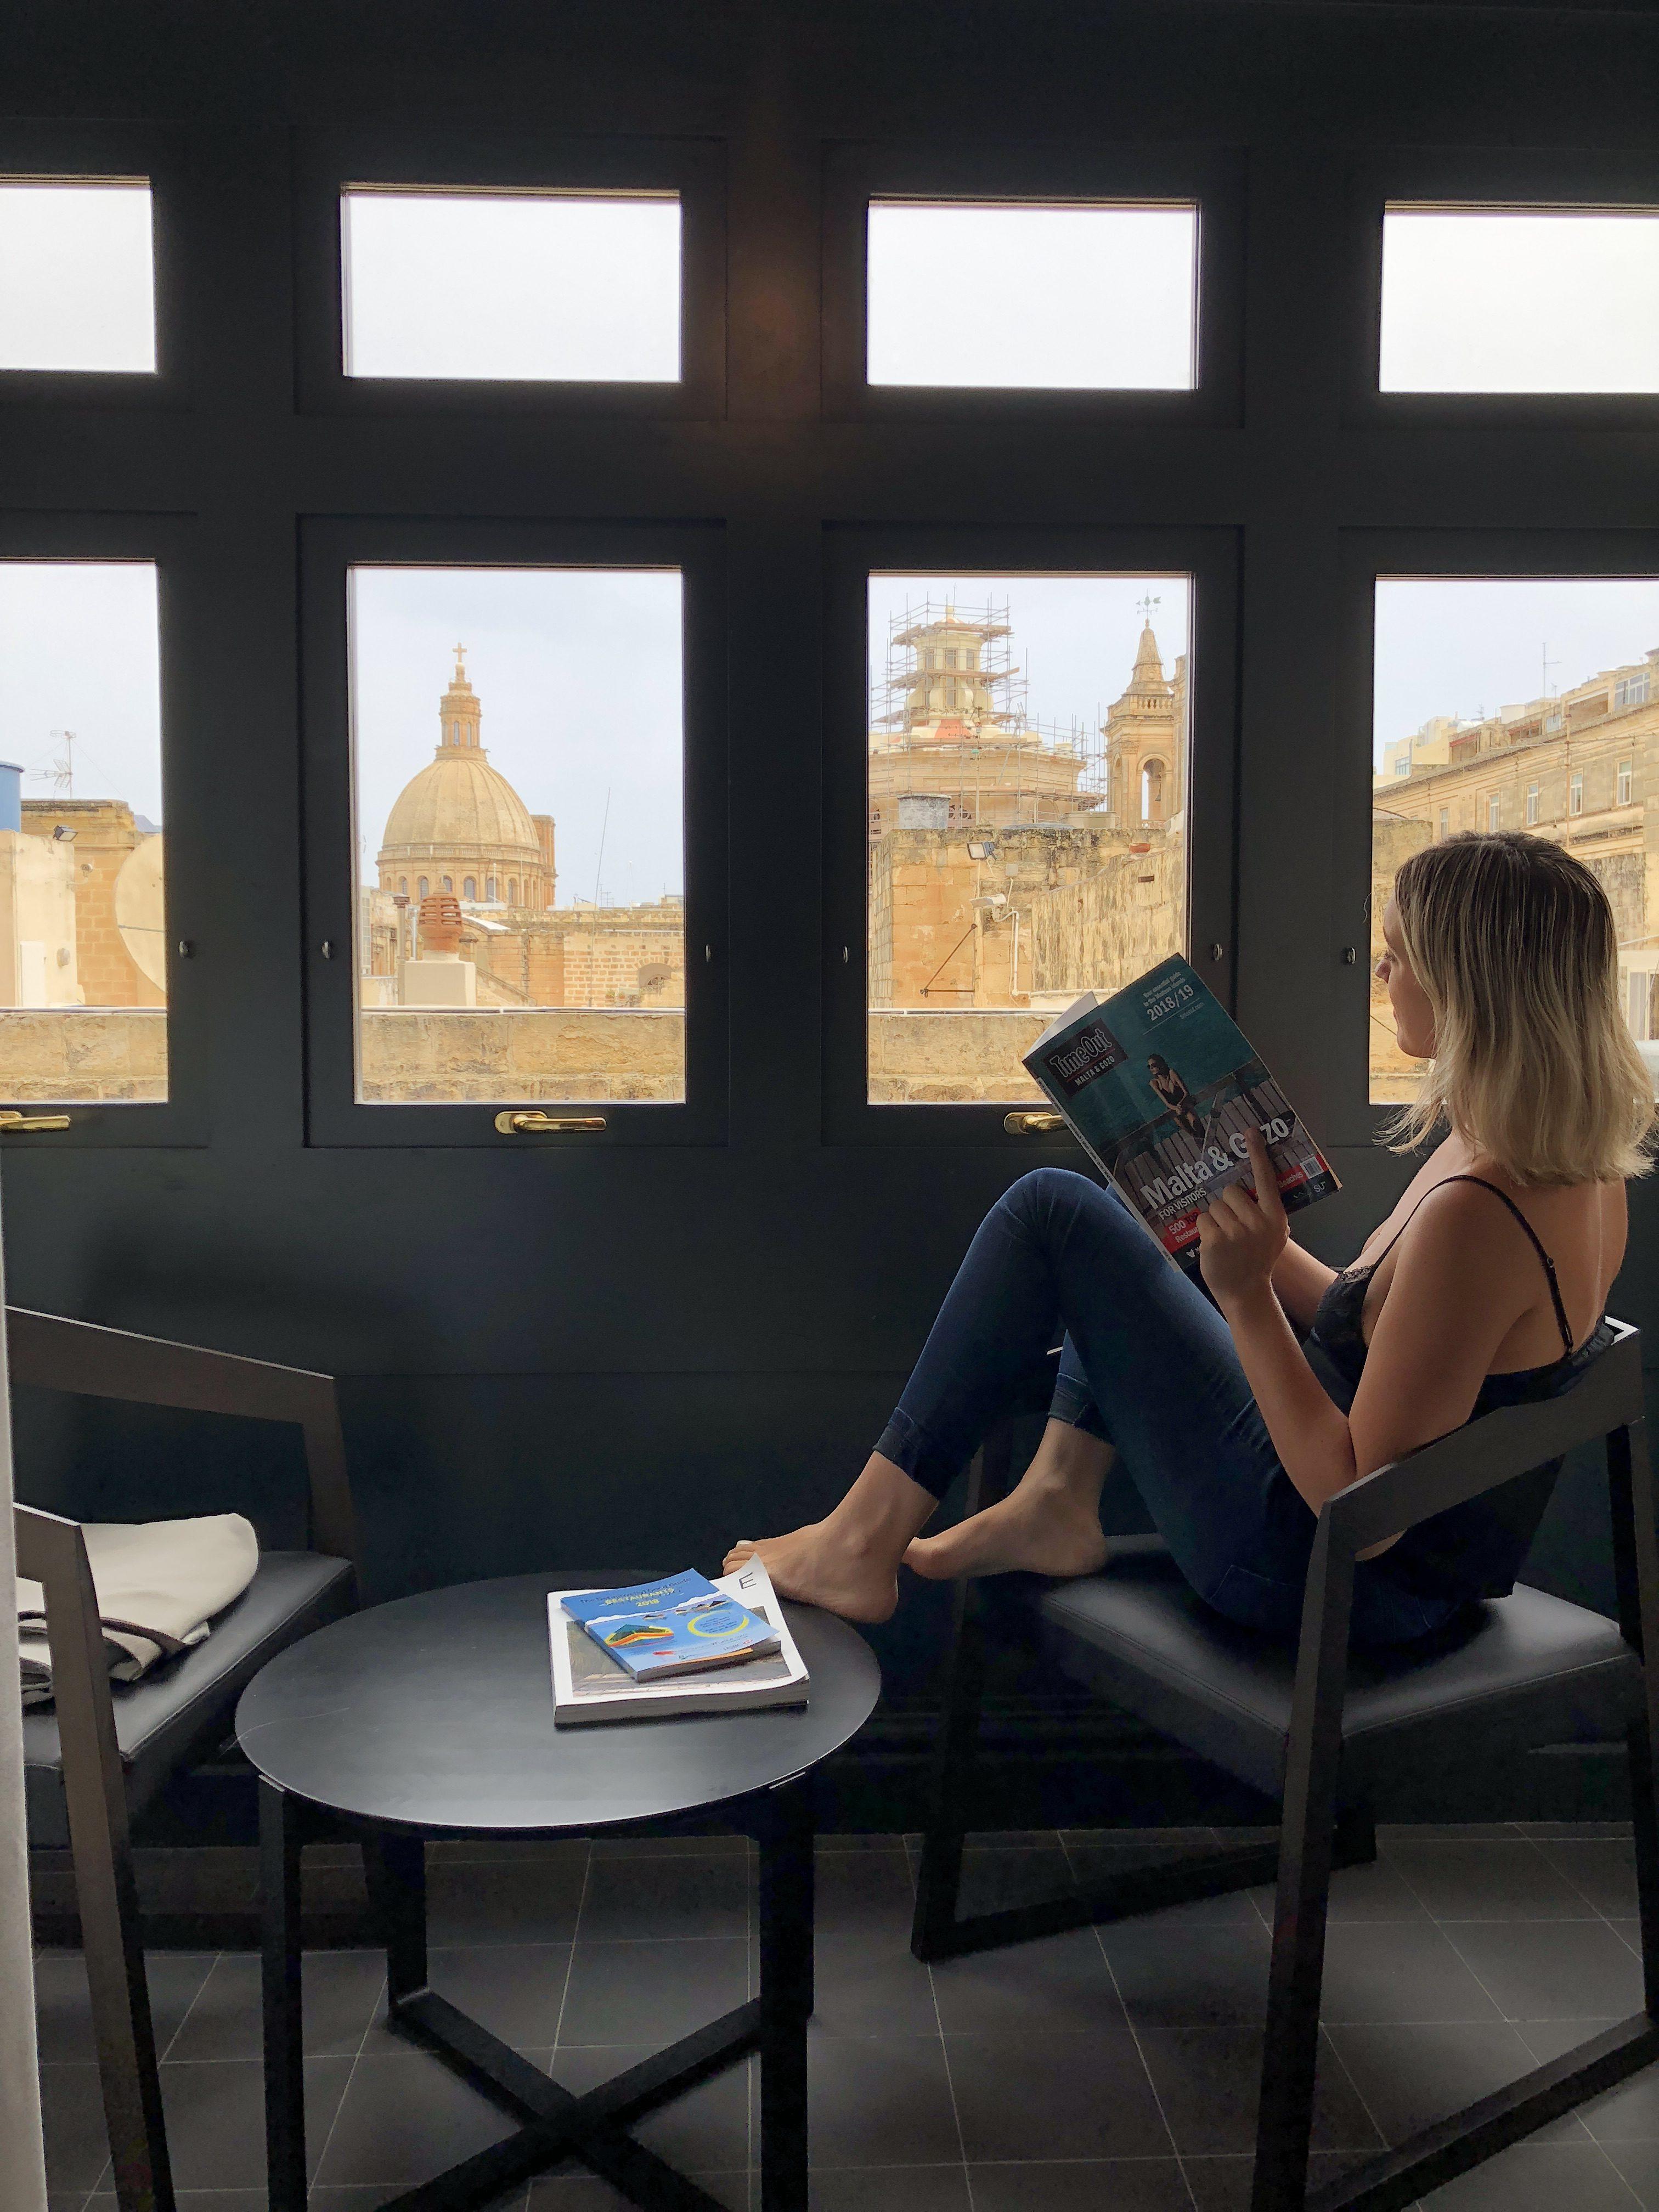 Onde dormir em Malta - Guia Malta